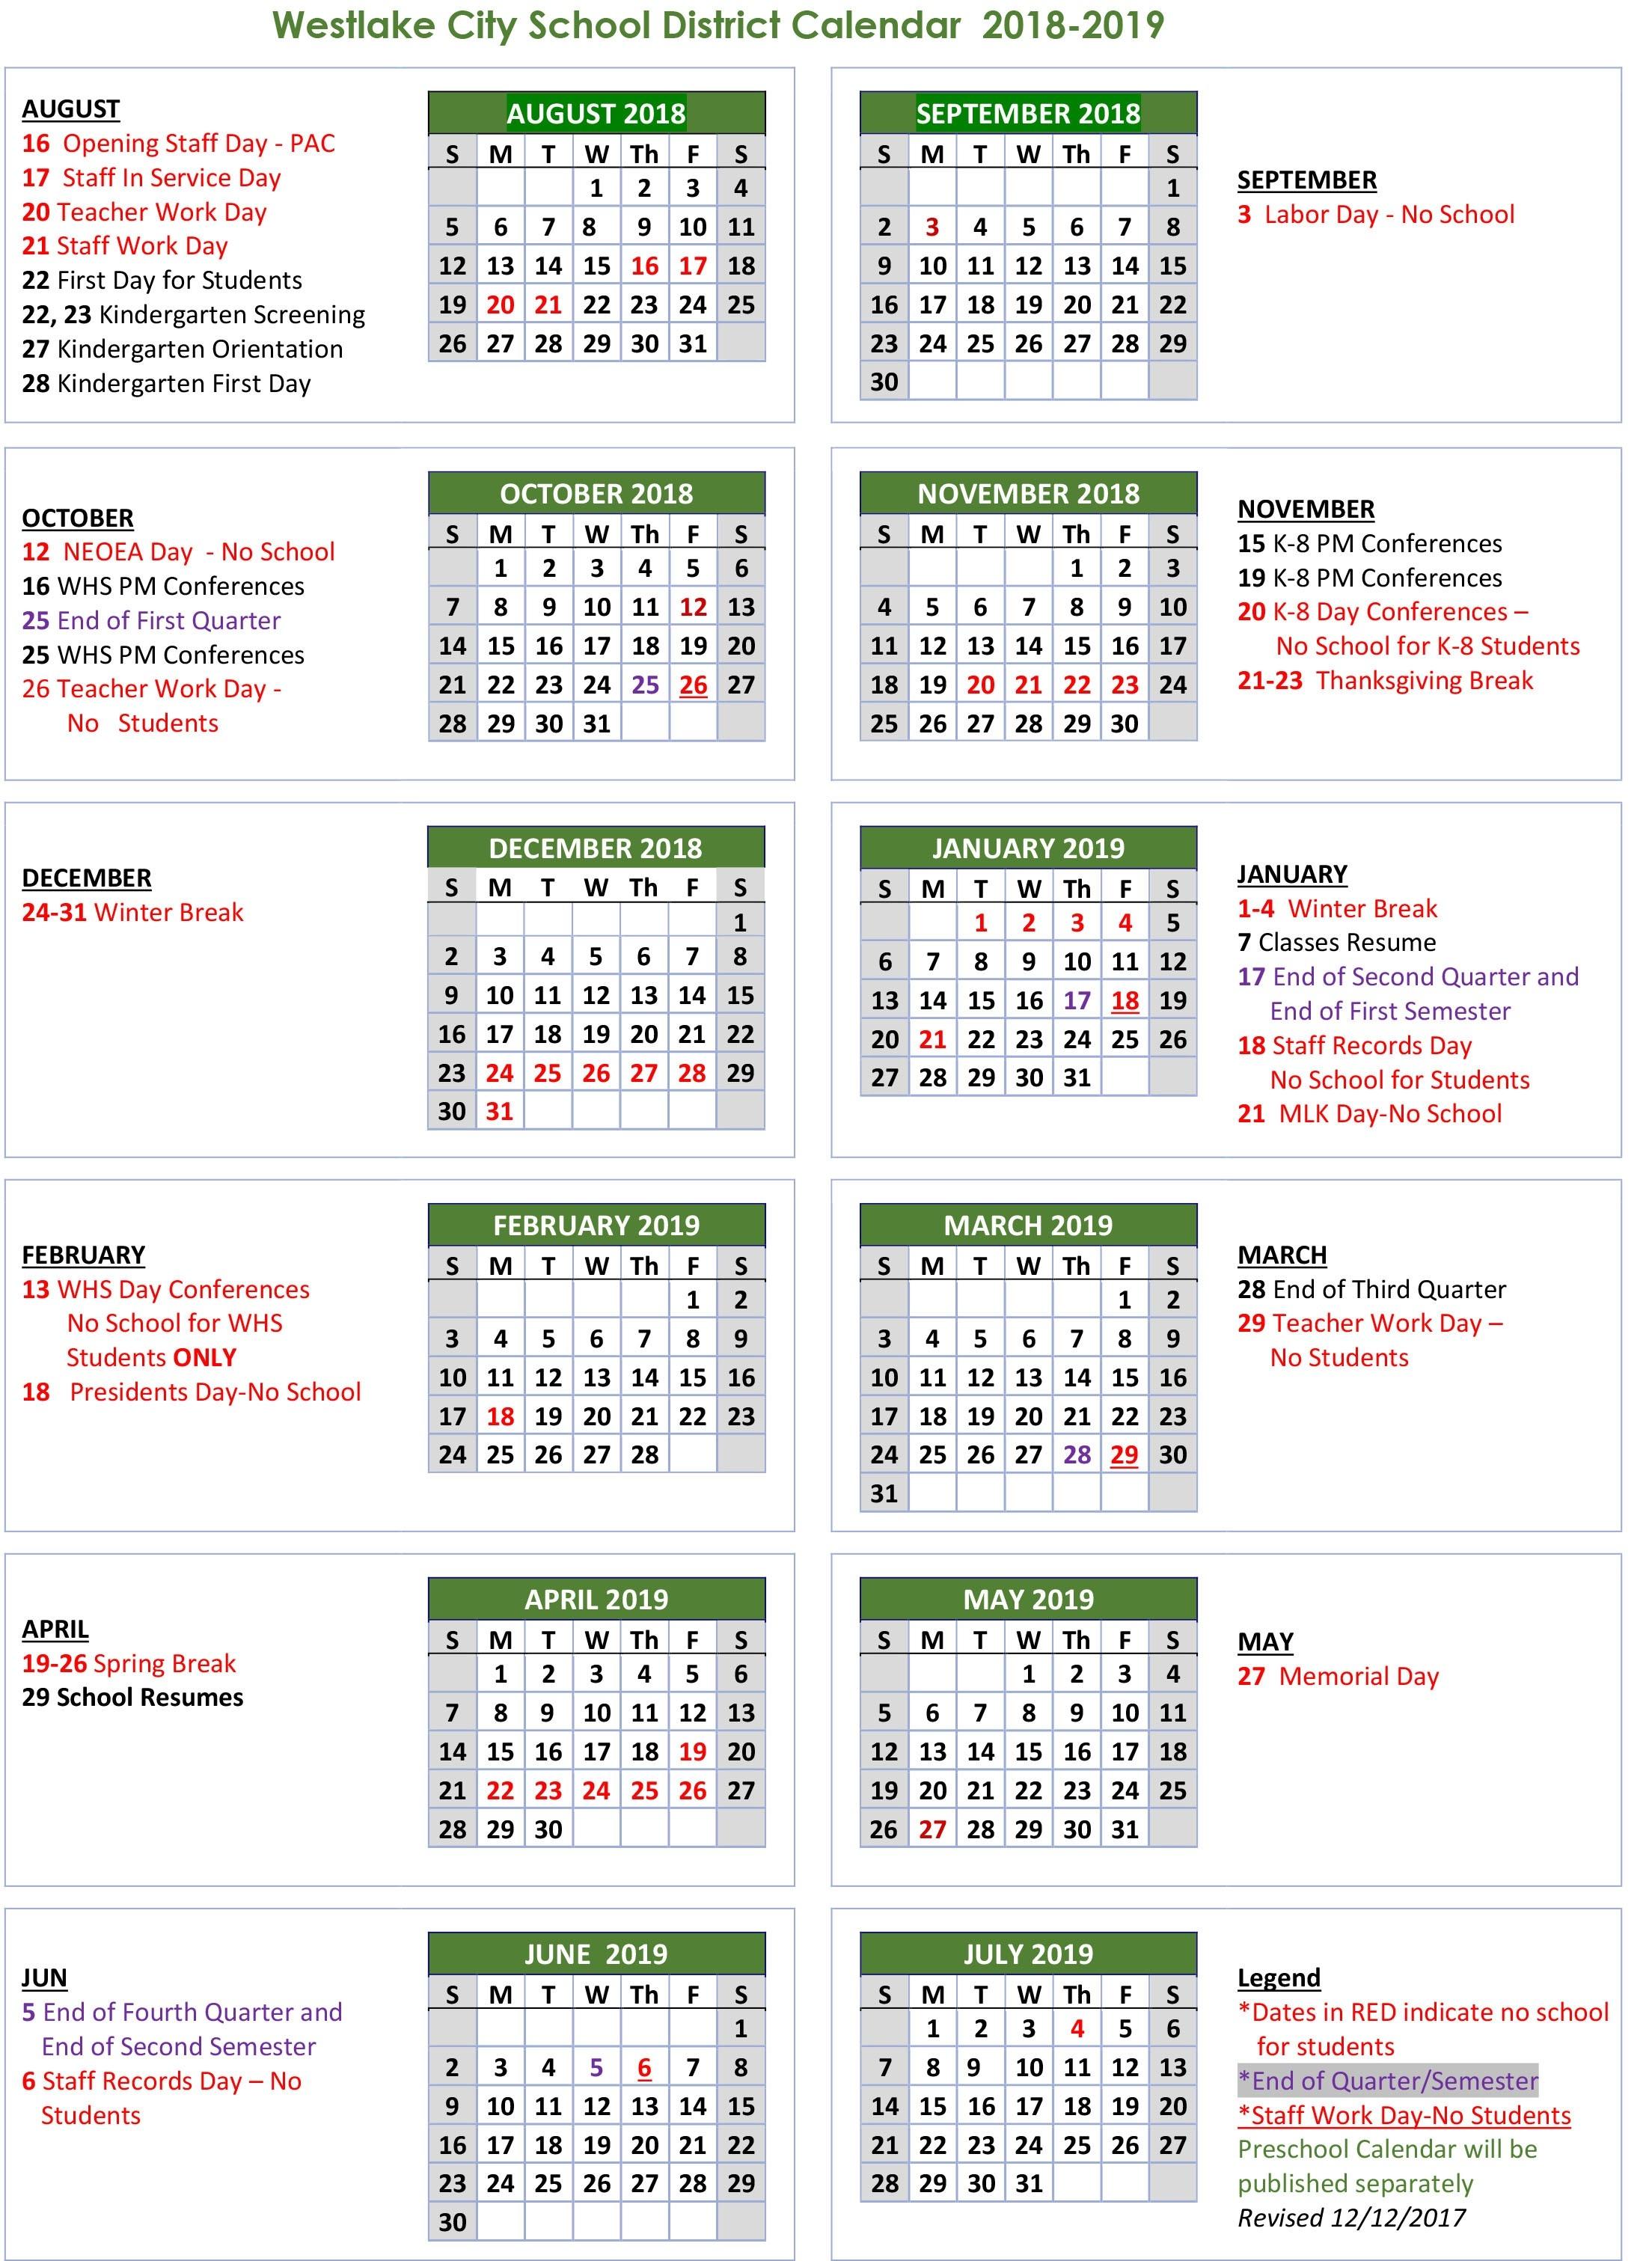 School Calendar - Westlake City School District-Monthly Wellness Calendar 2020 Pdf